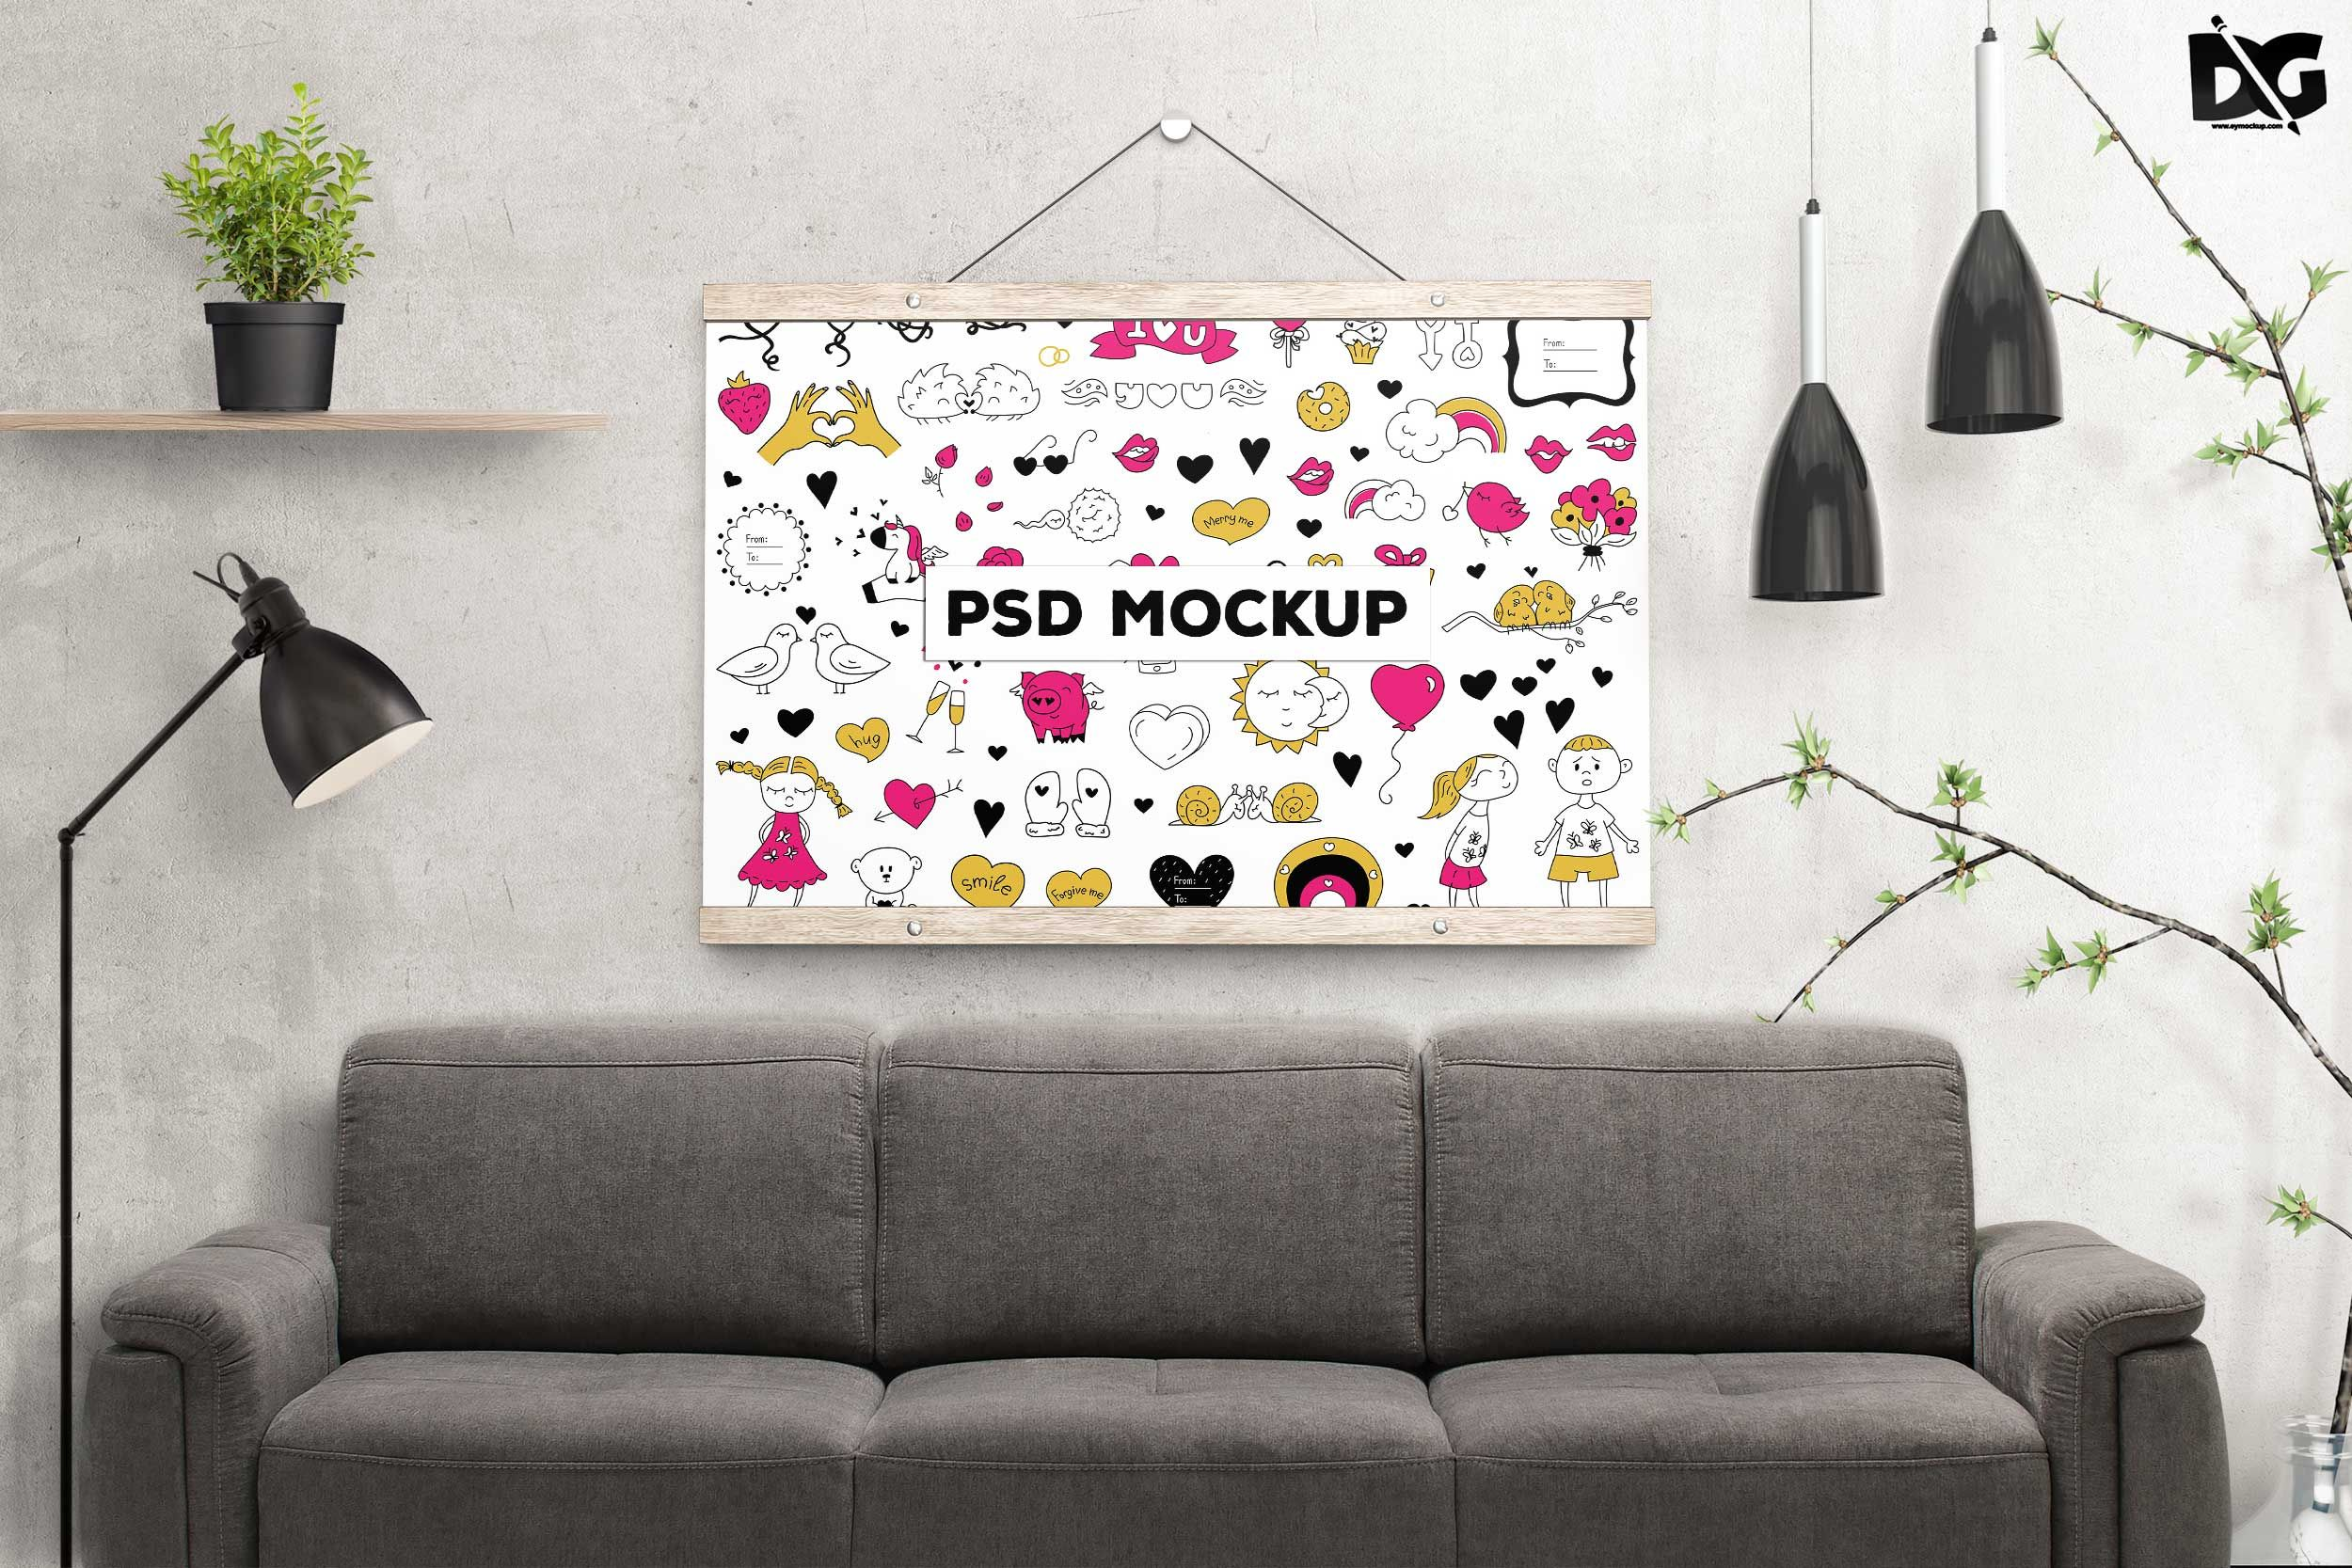 Free Psd Wall Poster Sofa Set Mockup Branding Download